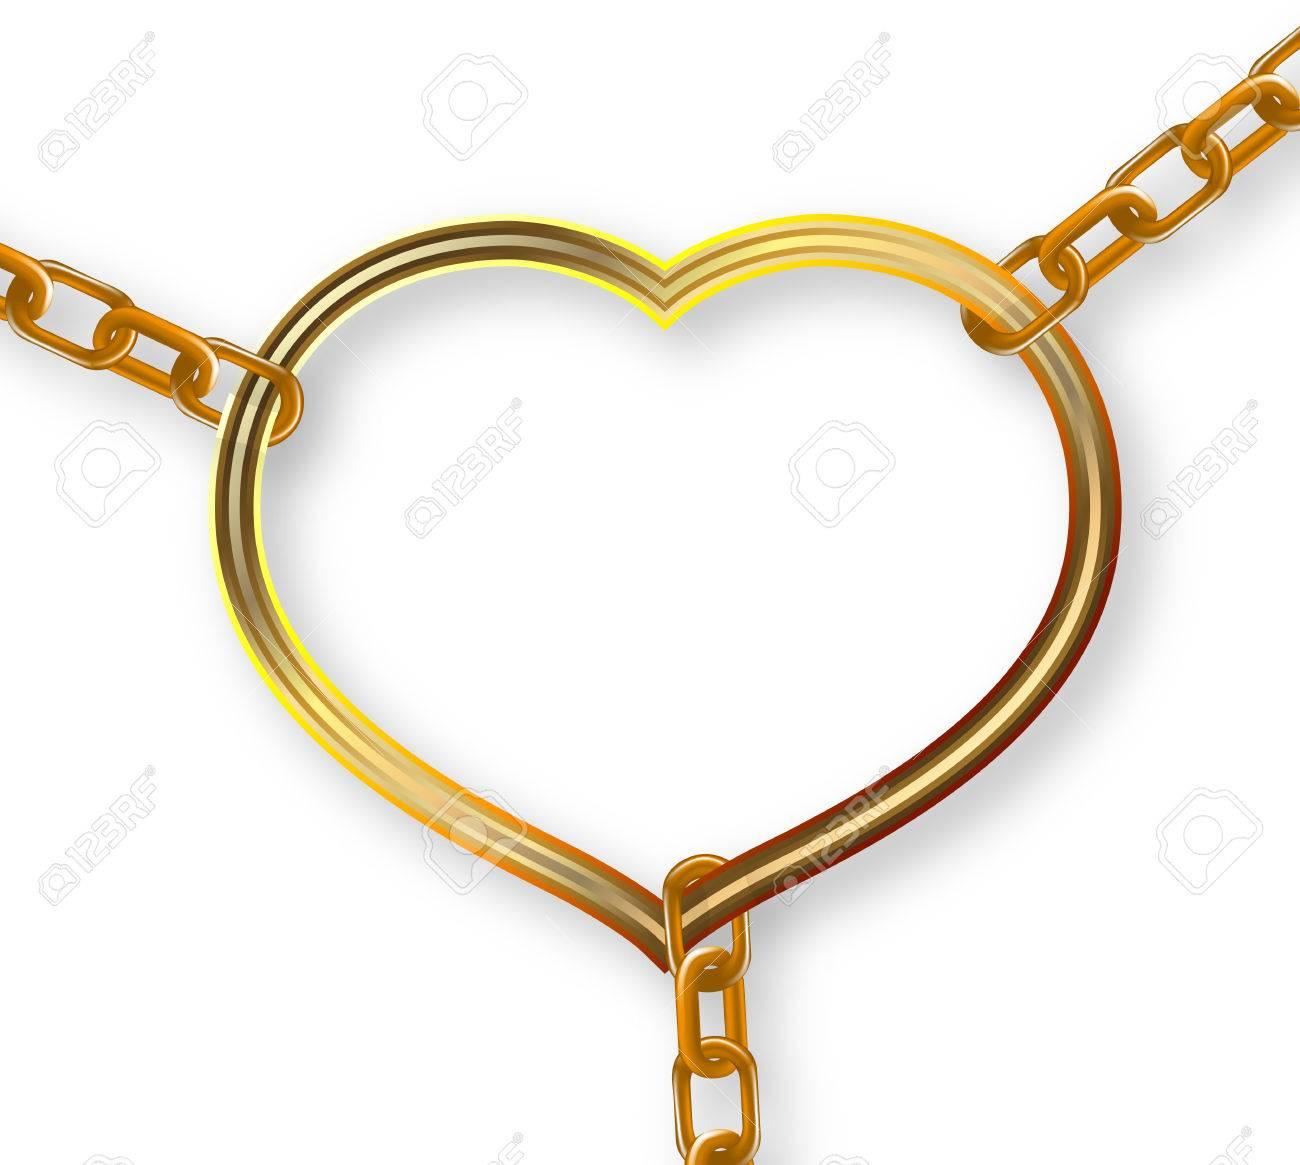 Heart Torn Trim Chains Vector Art Illustration Royalty Free - Clip-art-of-heart